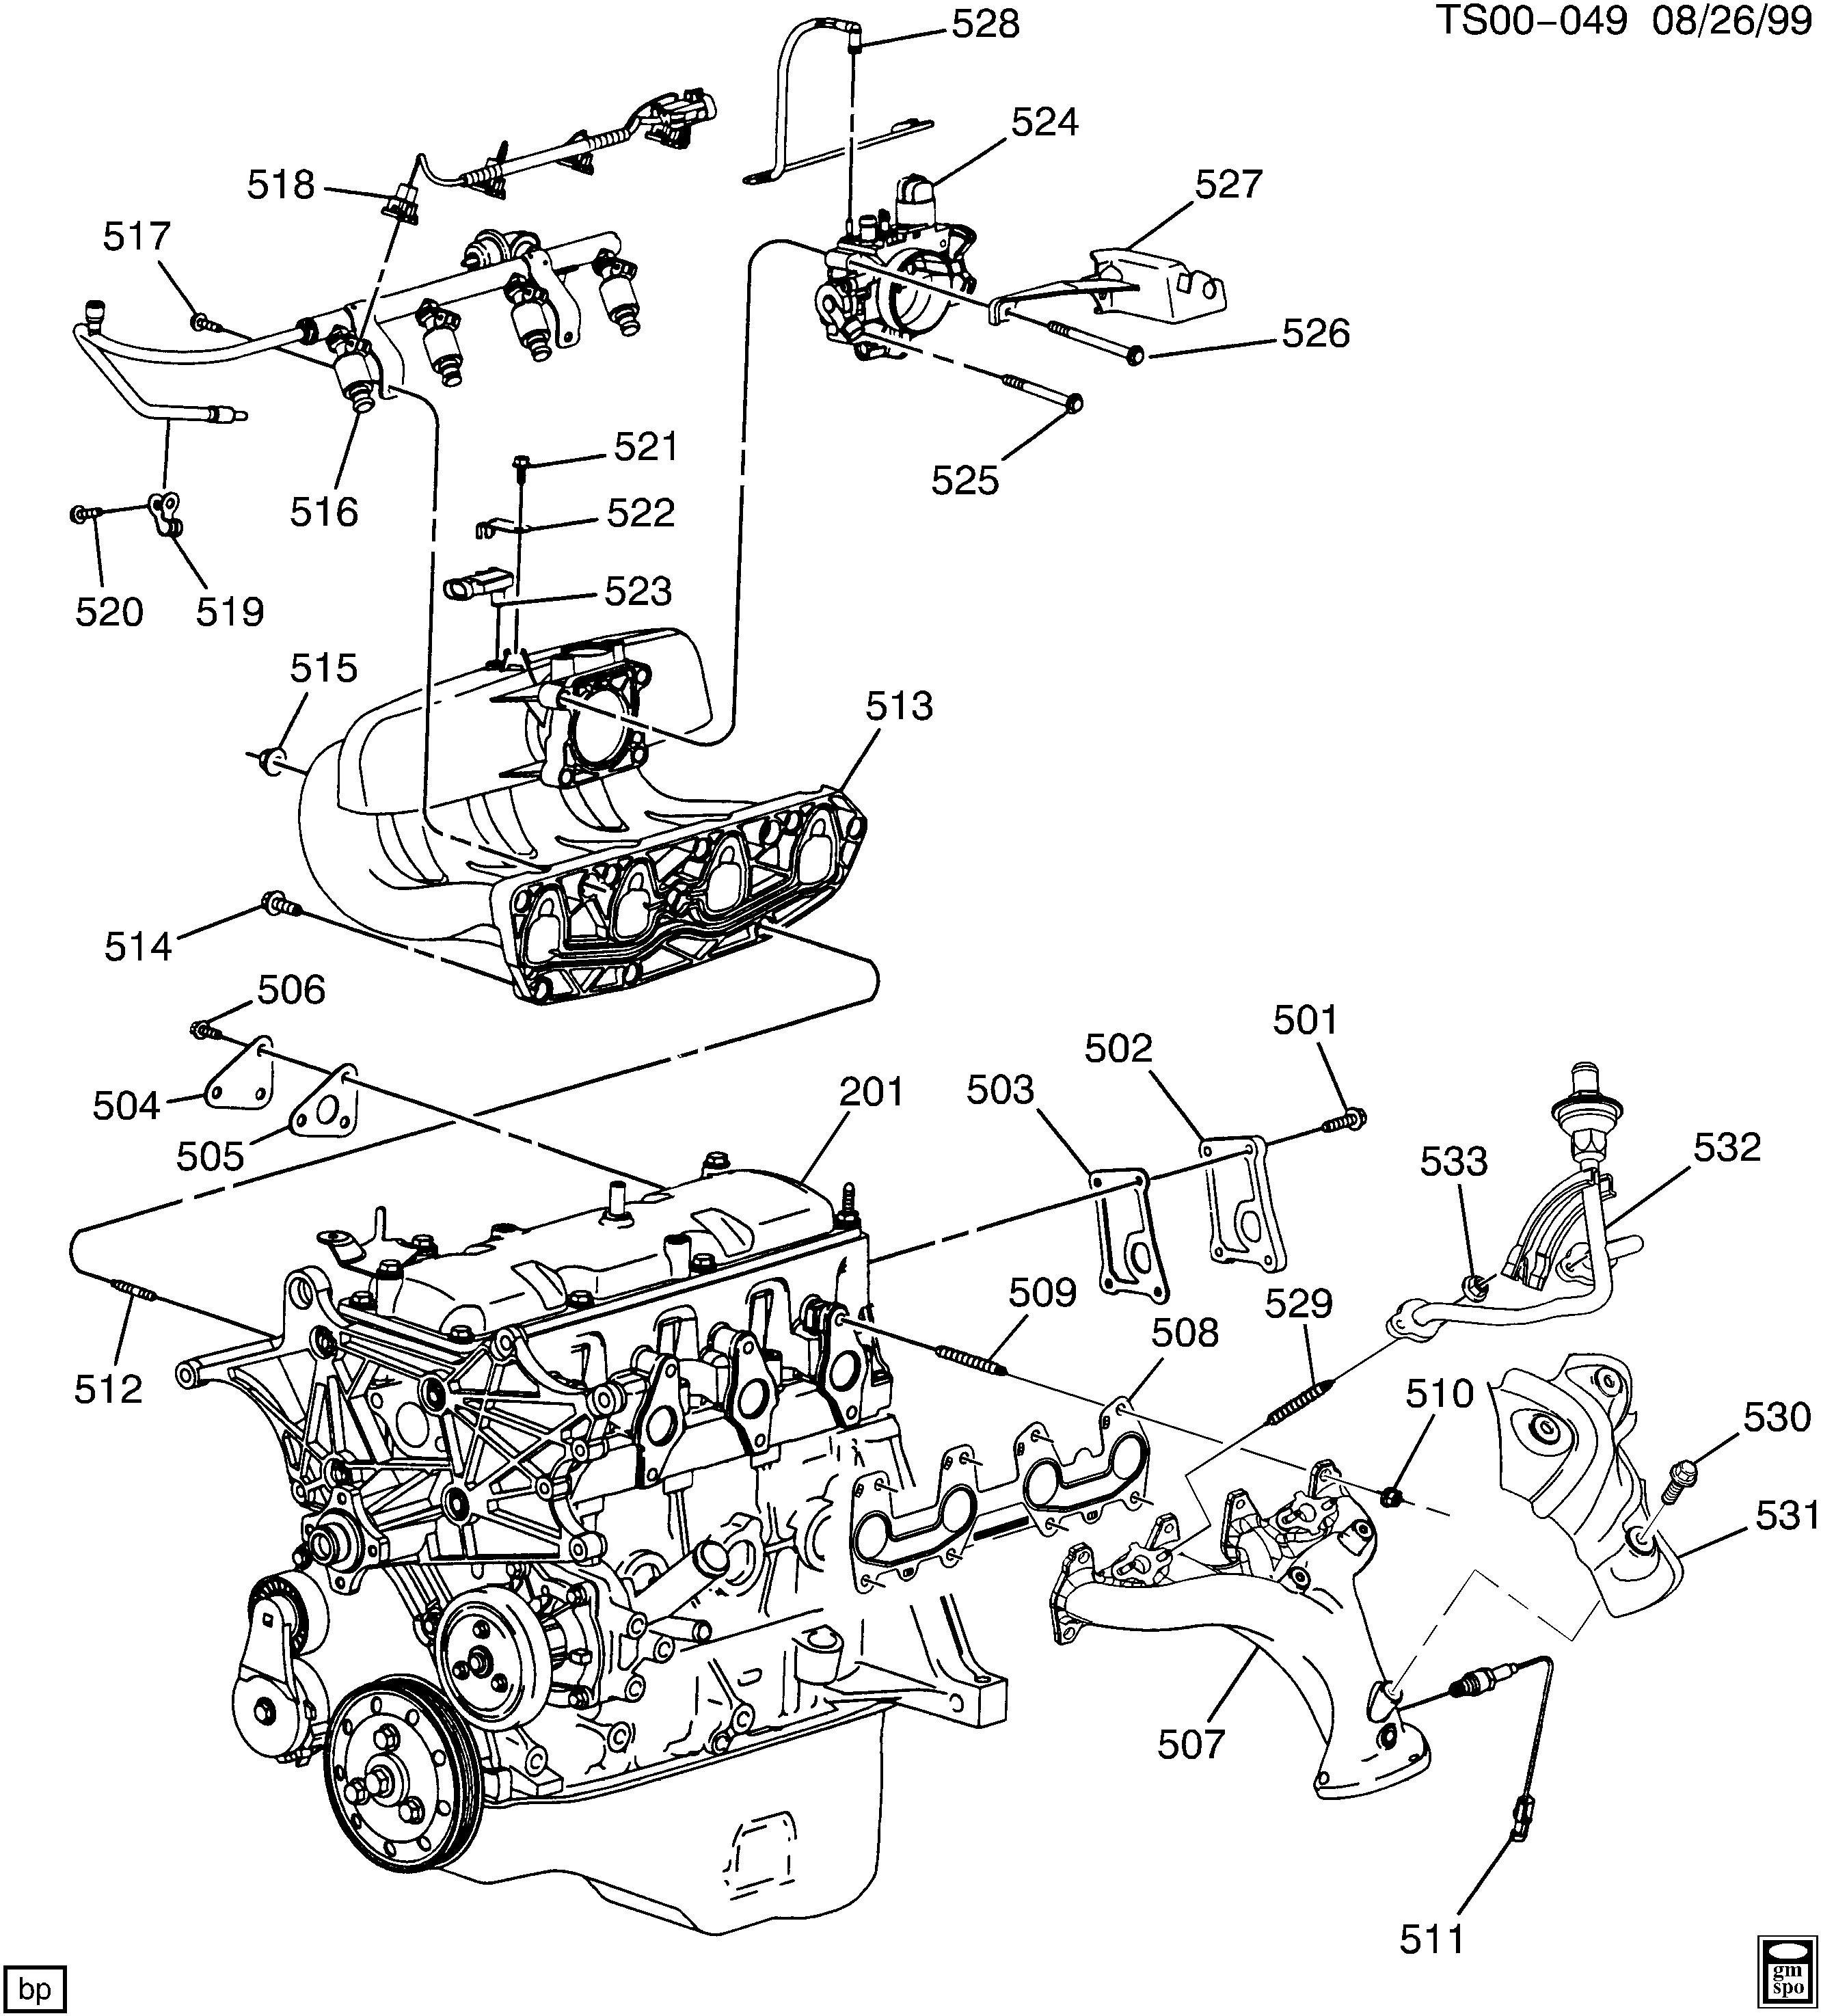 BLAZER TRAILBLAZER 2WD Engine asm 2 2l l4 part 5 manifold & fuel